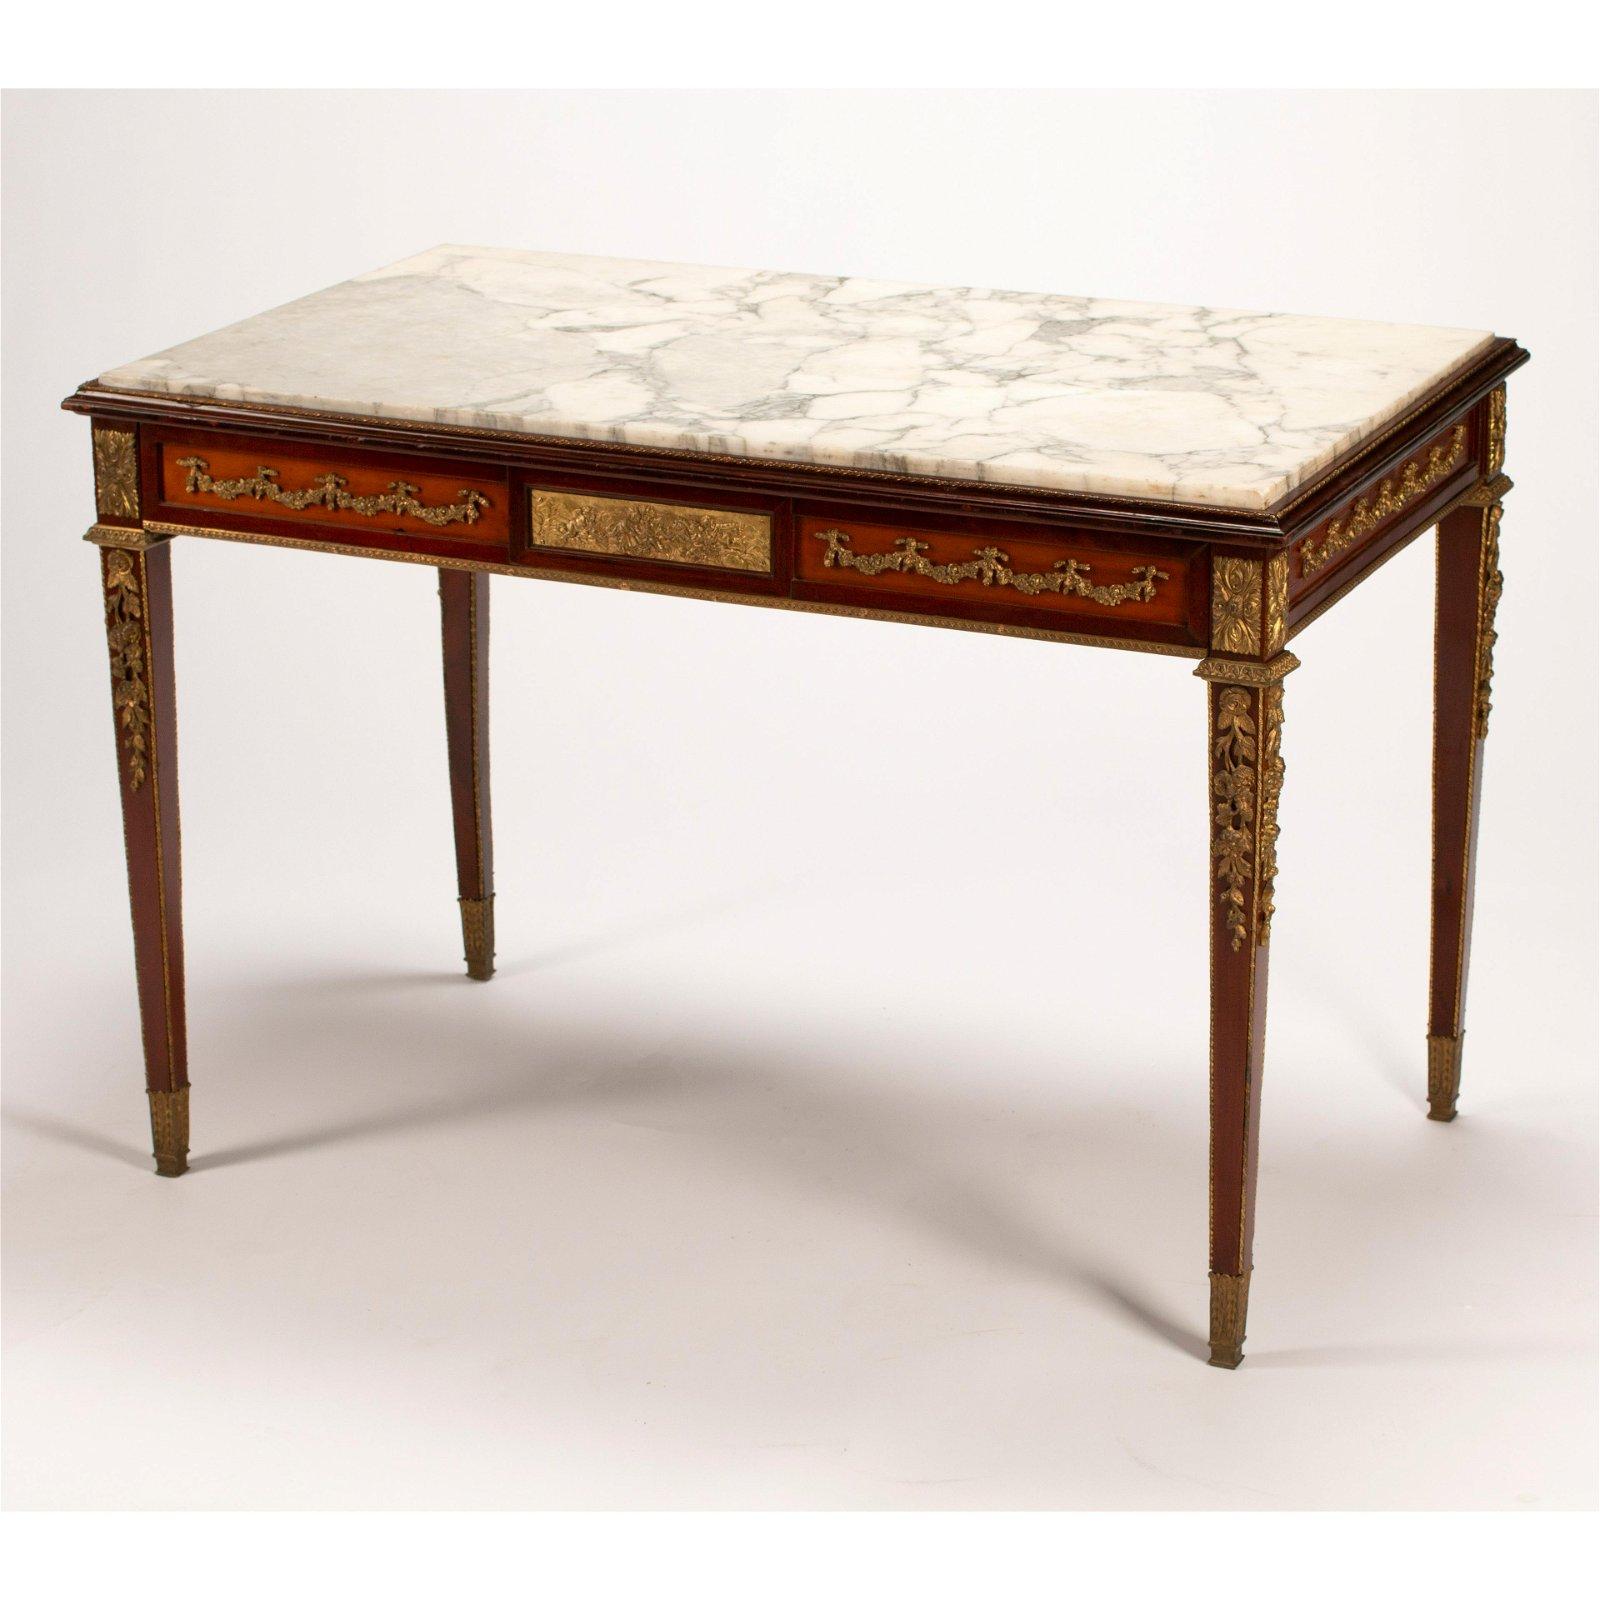 19th Century French Louis XVI Style Mahogany Marble Top